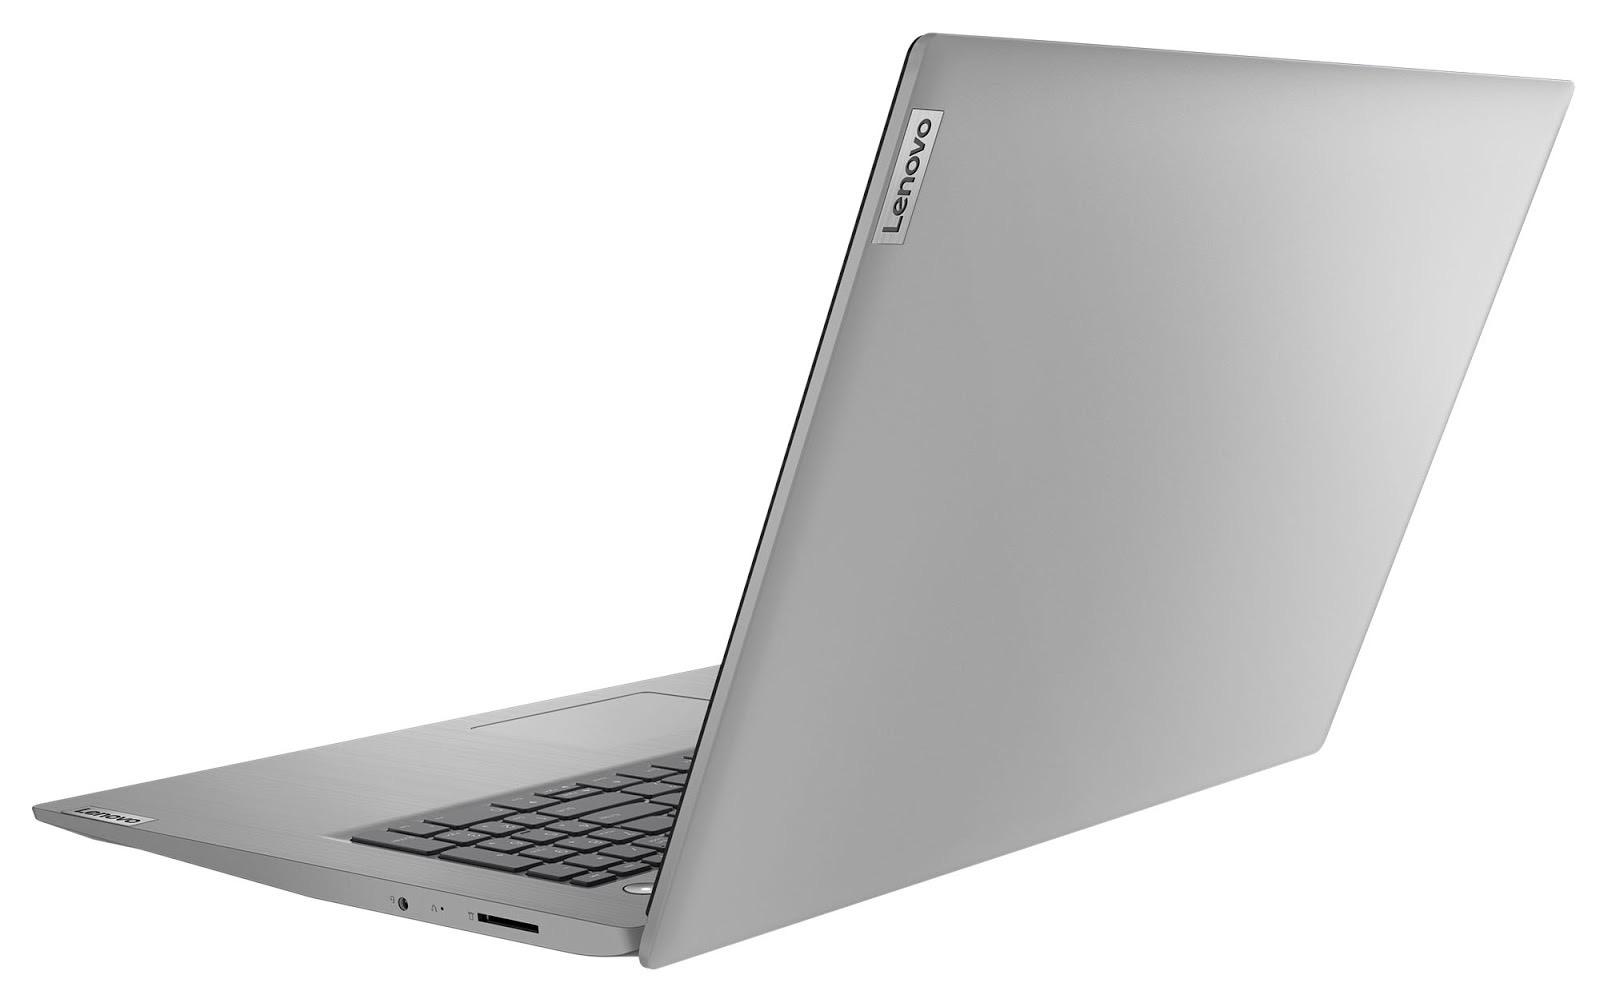 Фото 1. Ноутбук Lenovo ideapad 3 17IML05 Platinum Grey (81WC009LRE)